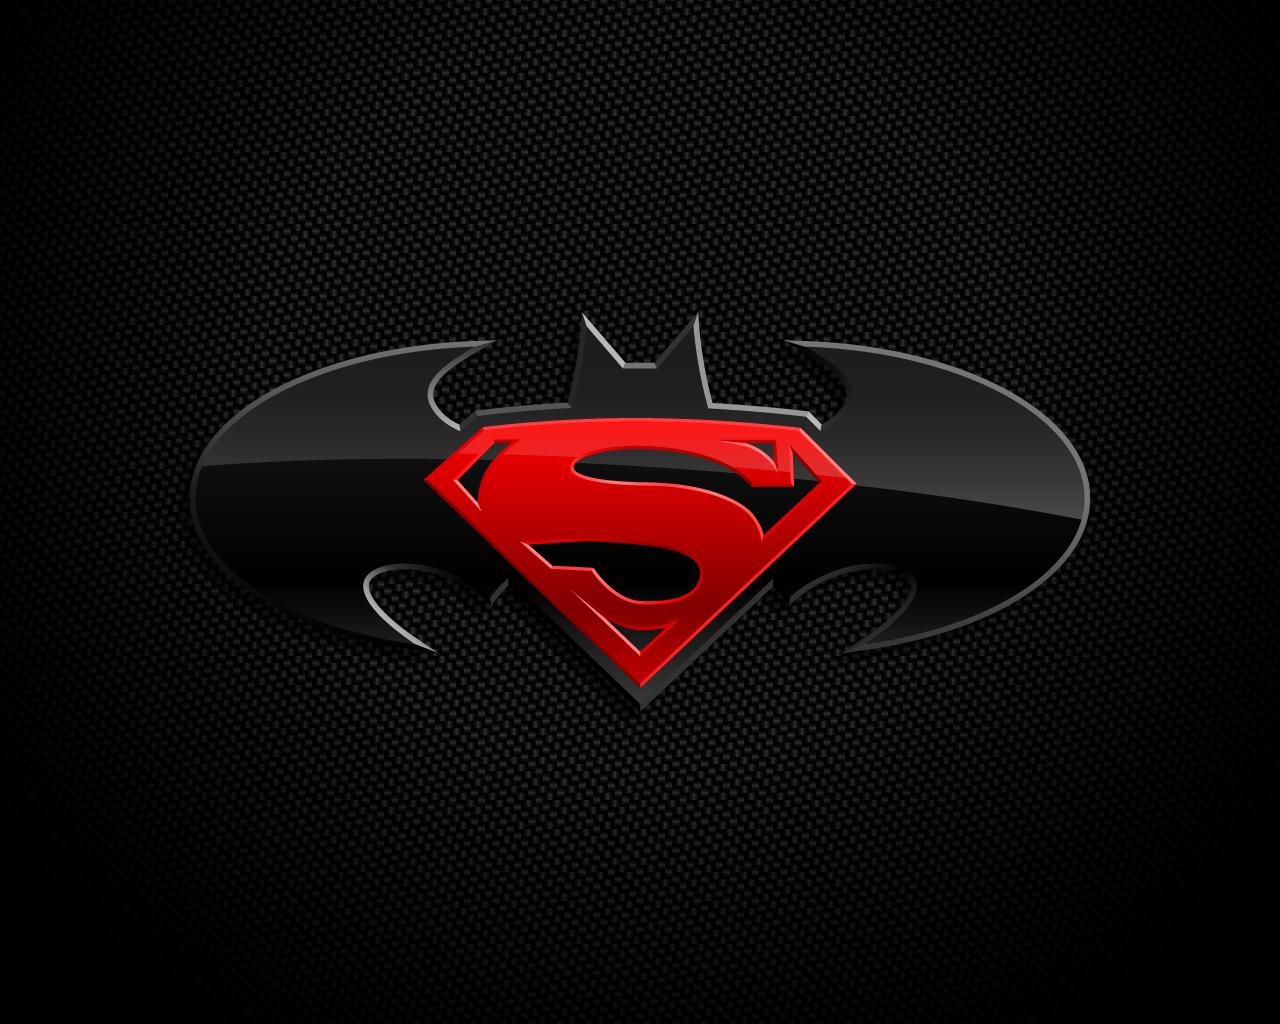 Cute Baby Girl Hd Wallpaper Download Batman With Superman Logos Logos Amp Brands